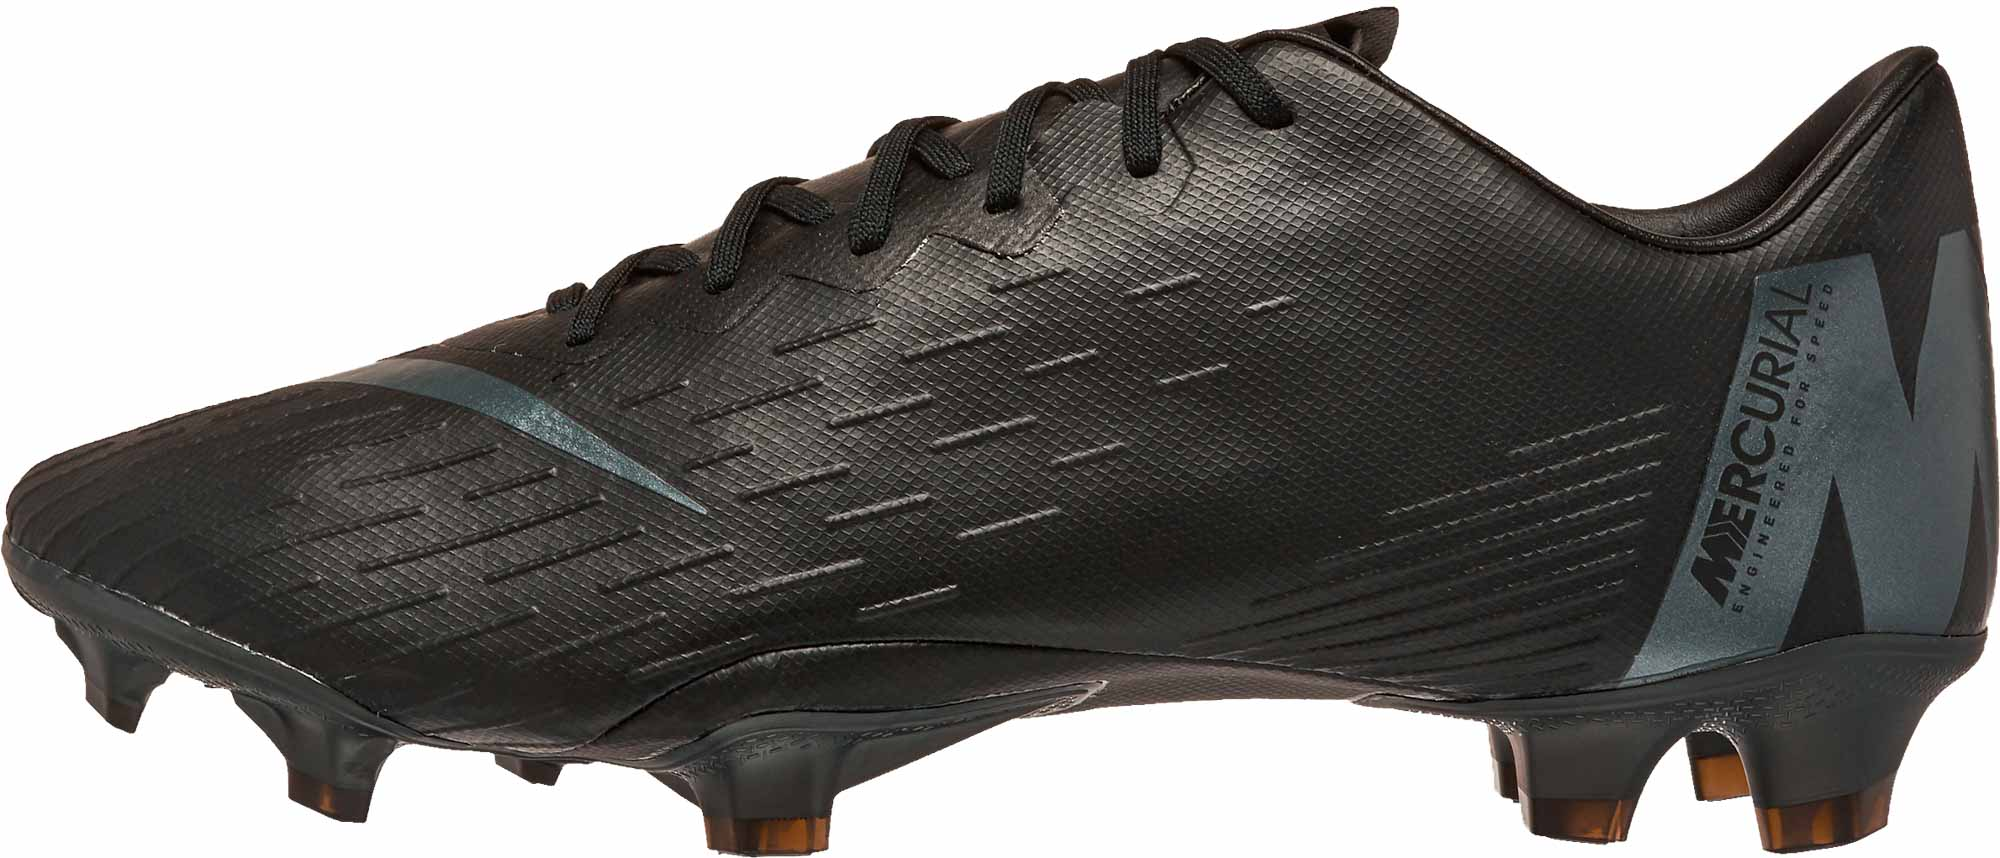 d310bbc116d Home   Shop By Brand   Nike Soccer   Nike Soccer Shoes   Nike Mercurial  Vapor ...